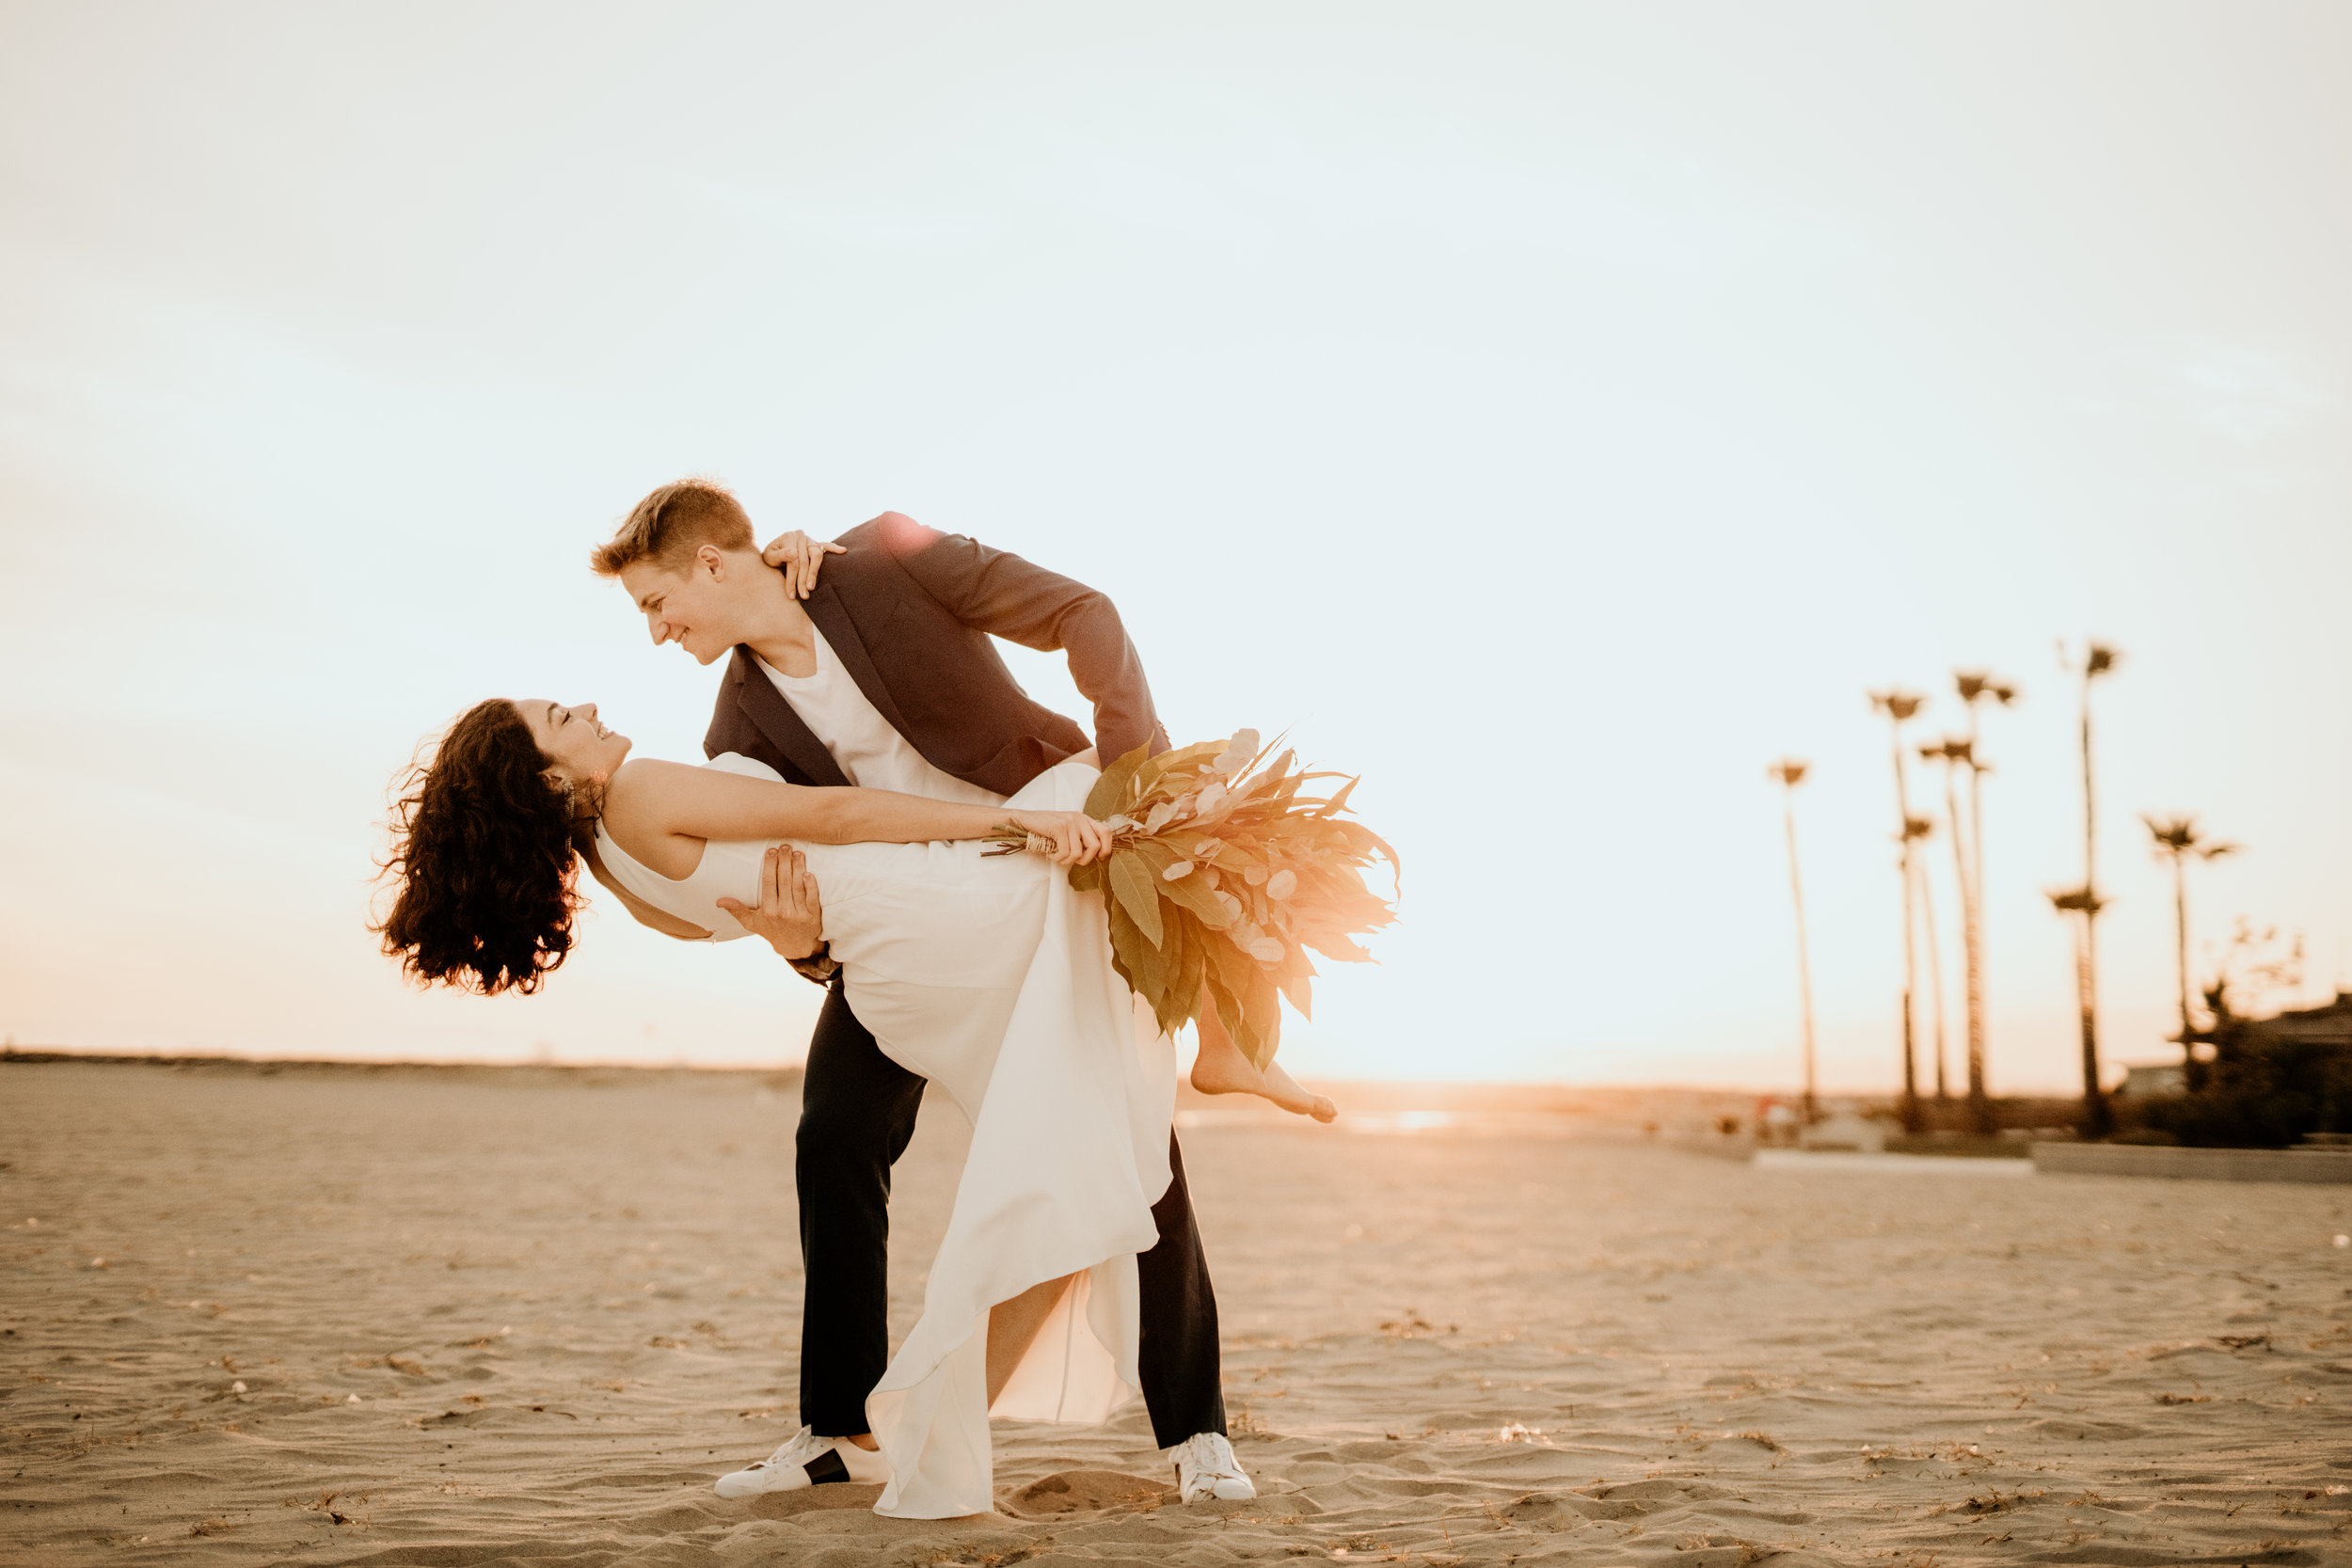 BEACH-COUPLES-ENGAGEMENT-8656.jpg